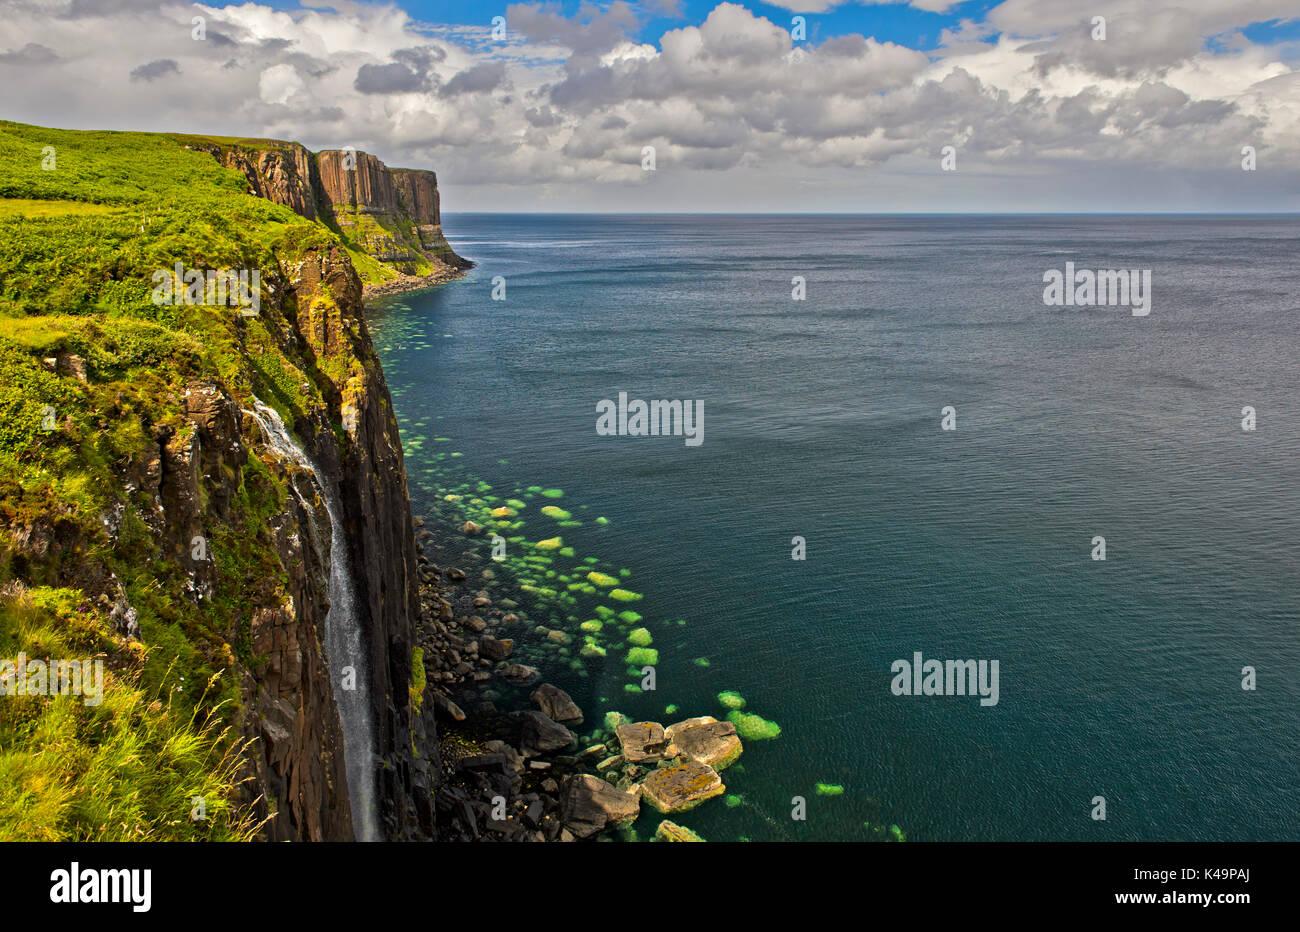 Kilt Rock Basalt Cliffs With Mealt Falls Near Staffin, Isle Of Skye, Scotland, Great Britain - Stock Image